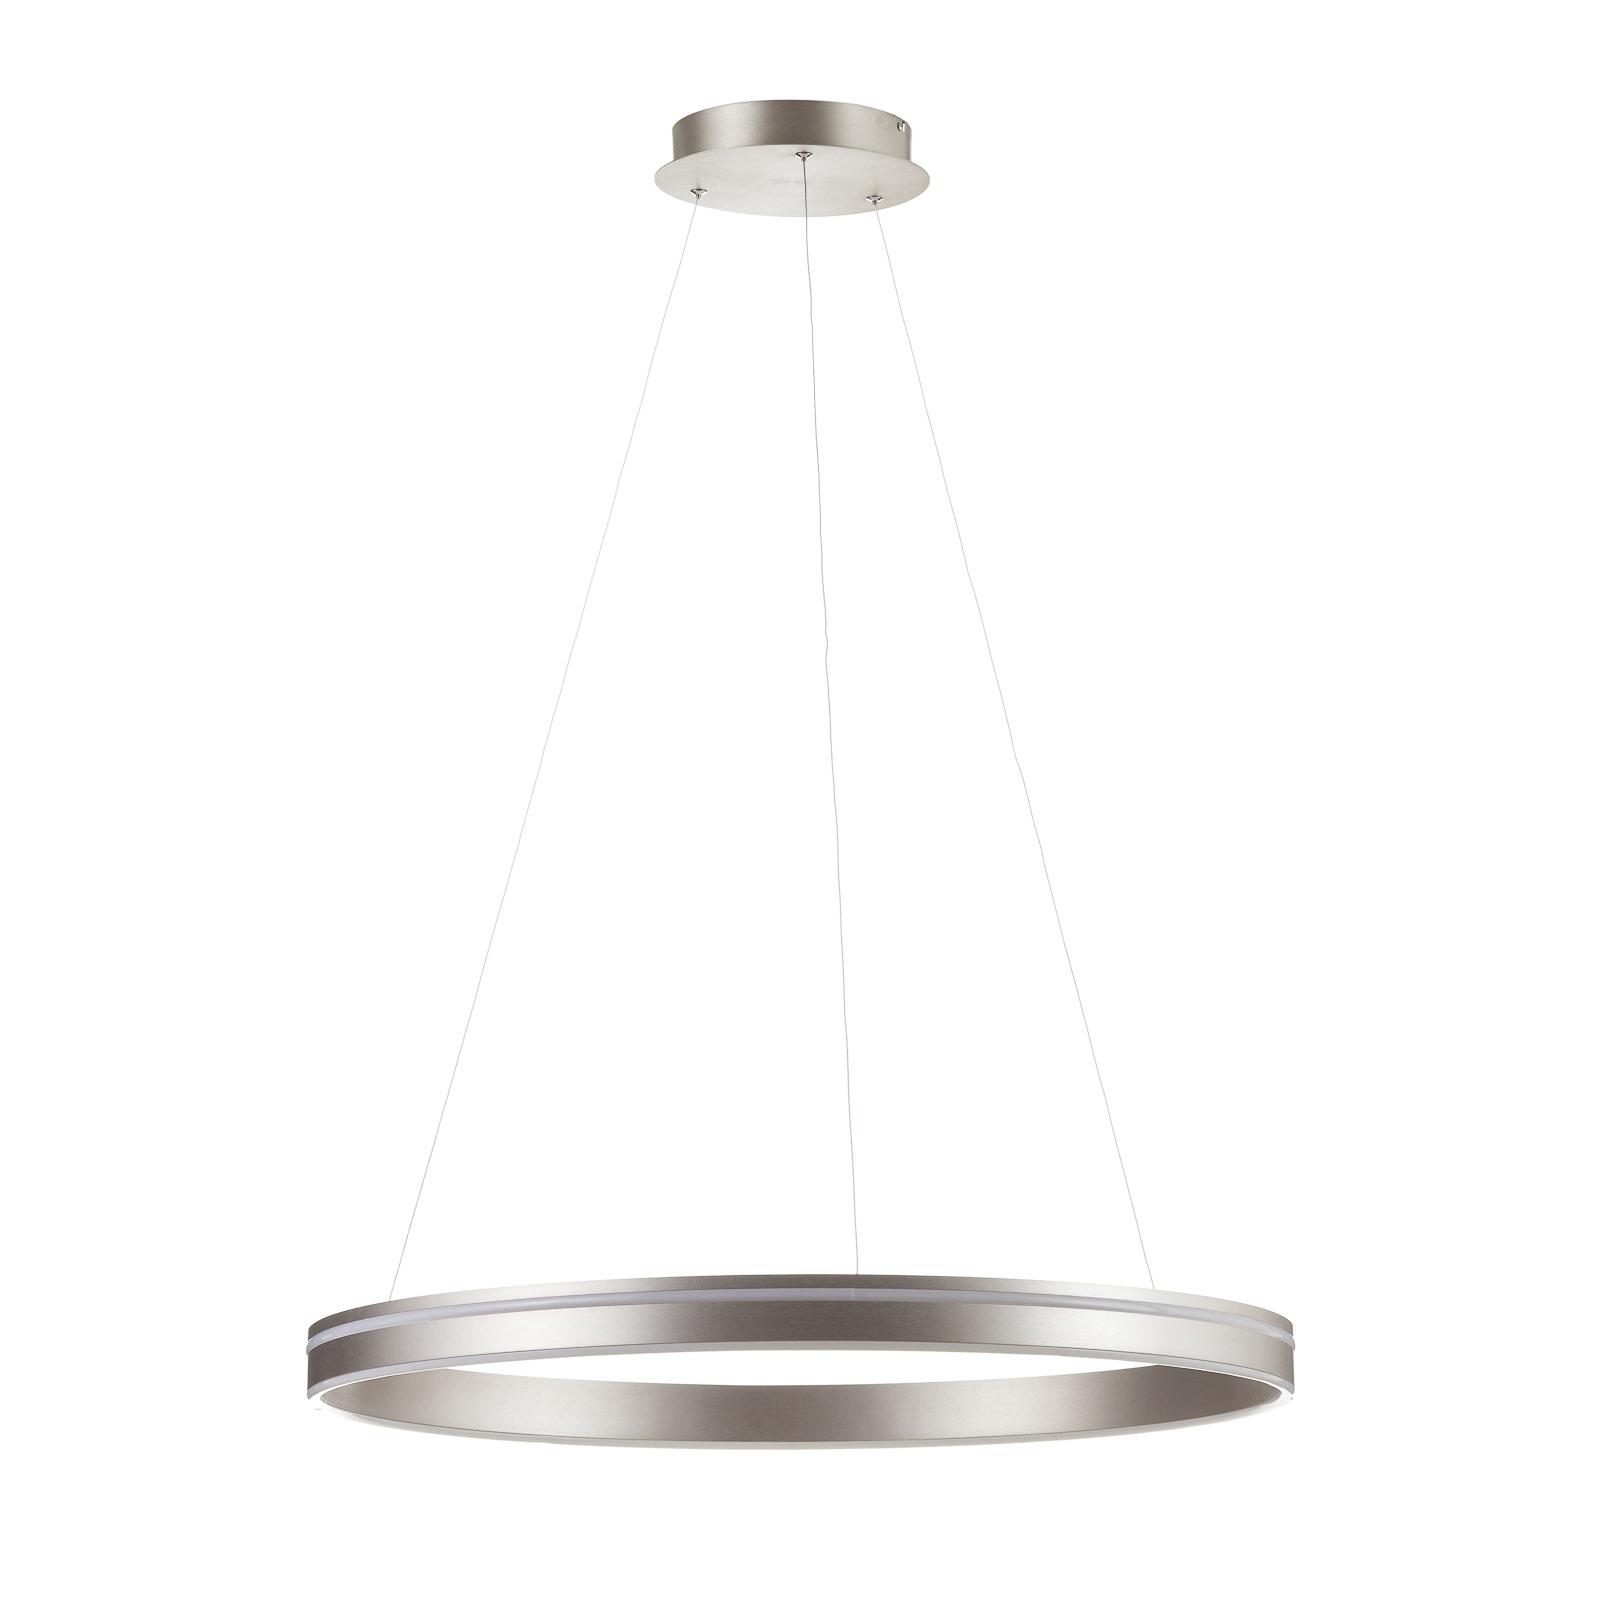 Paul Neuhaus Q-VITO LED hanglamp 79cm staal